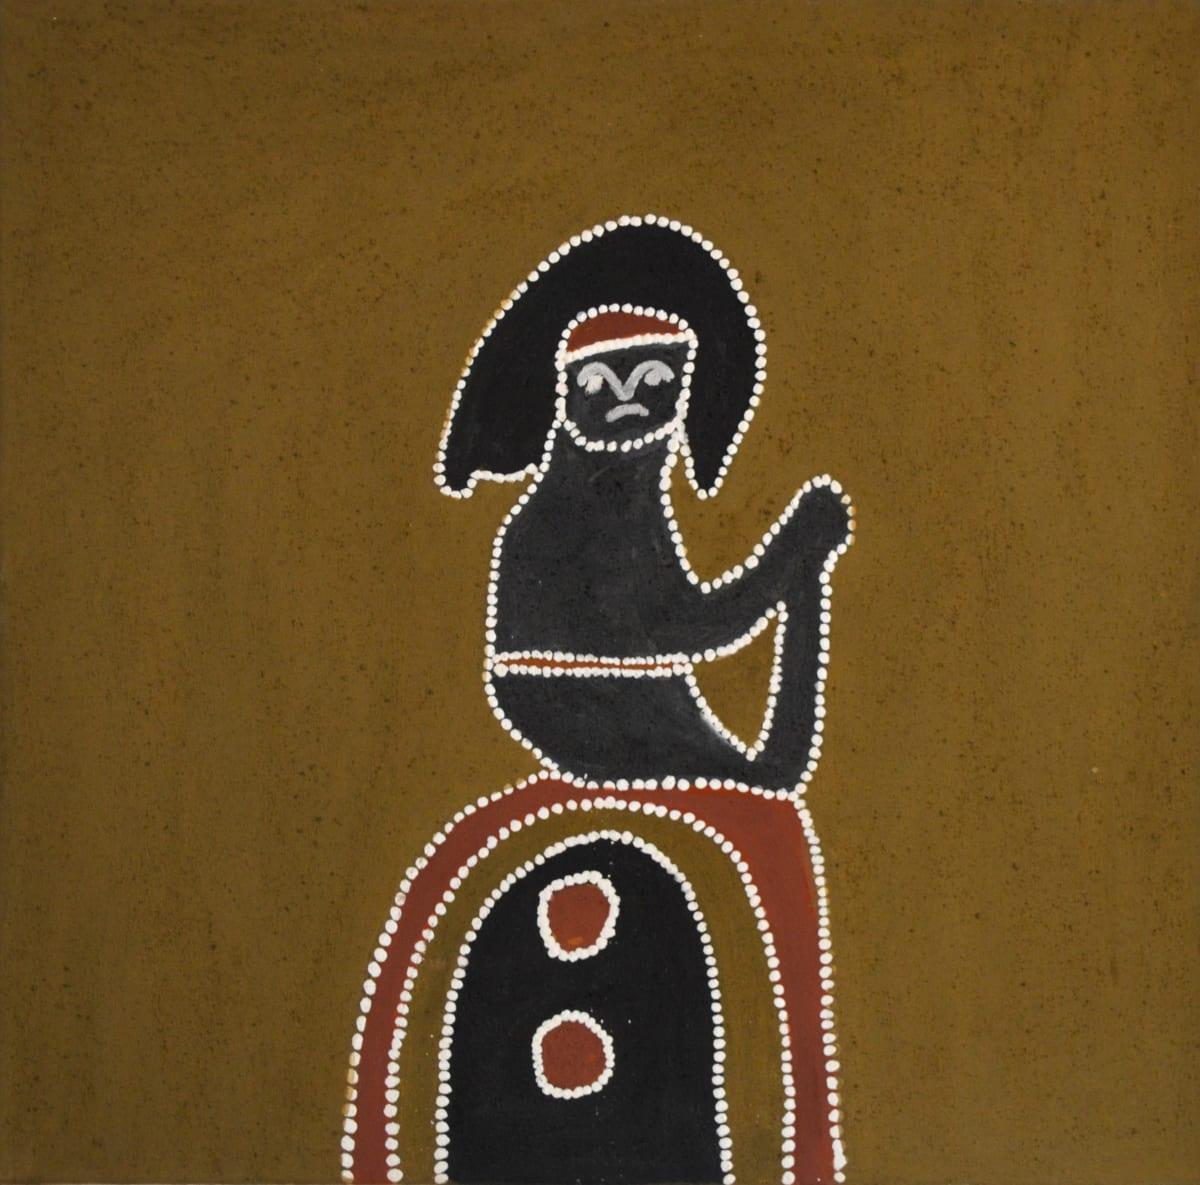 Mabel Juli MARRANYJI DU JIYIRRINY natural ochre and pigments on canvas 80 x 80 cm